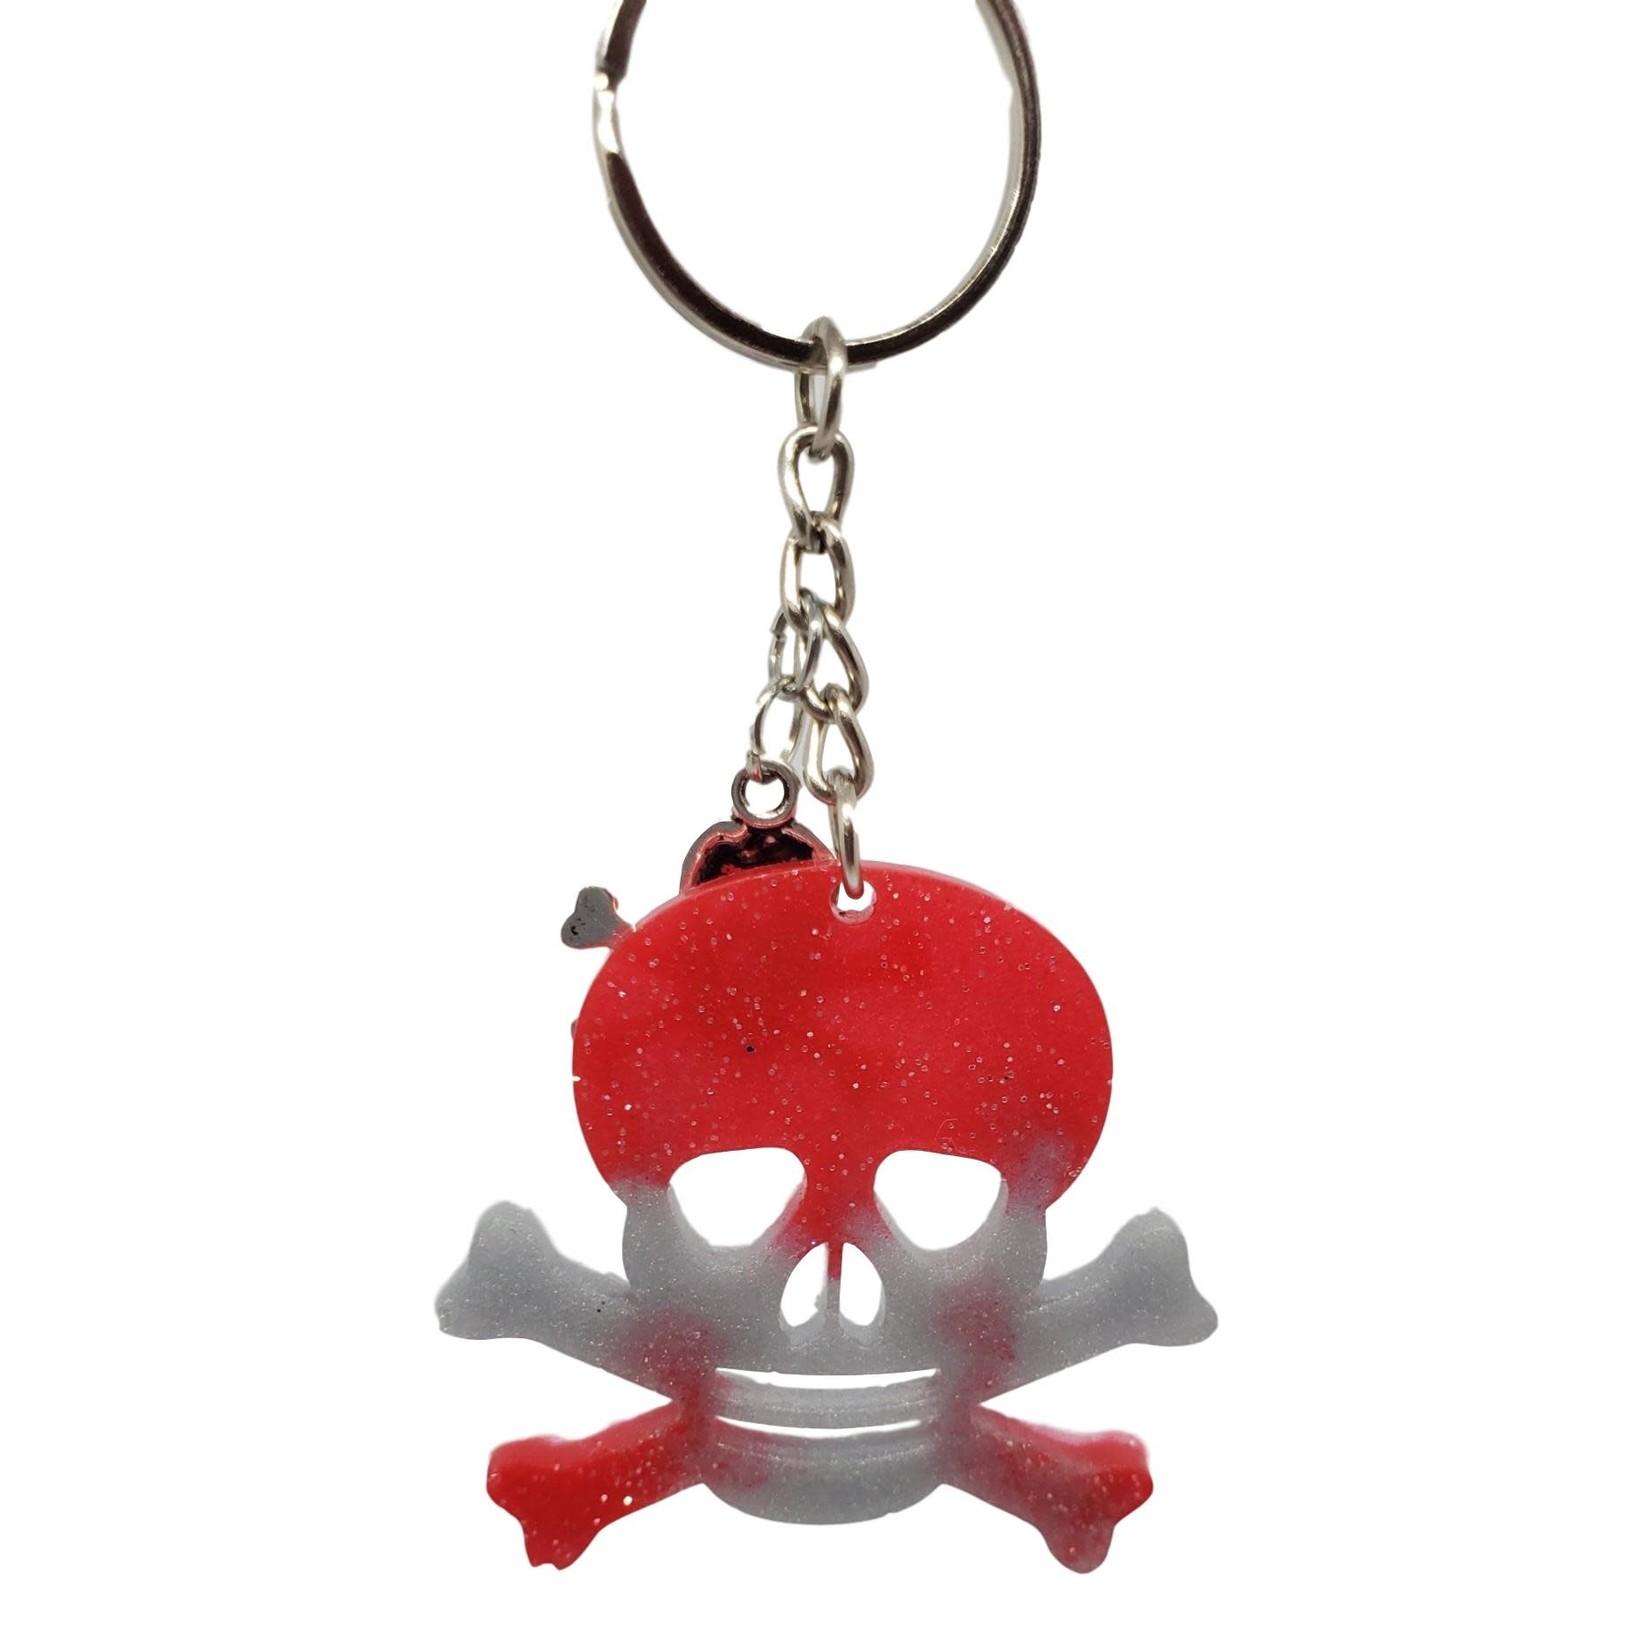 East Coast Sirens Red & Grey Skull Key Chain